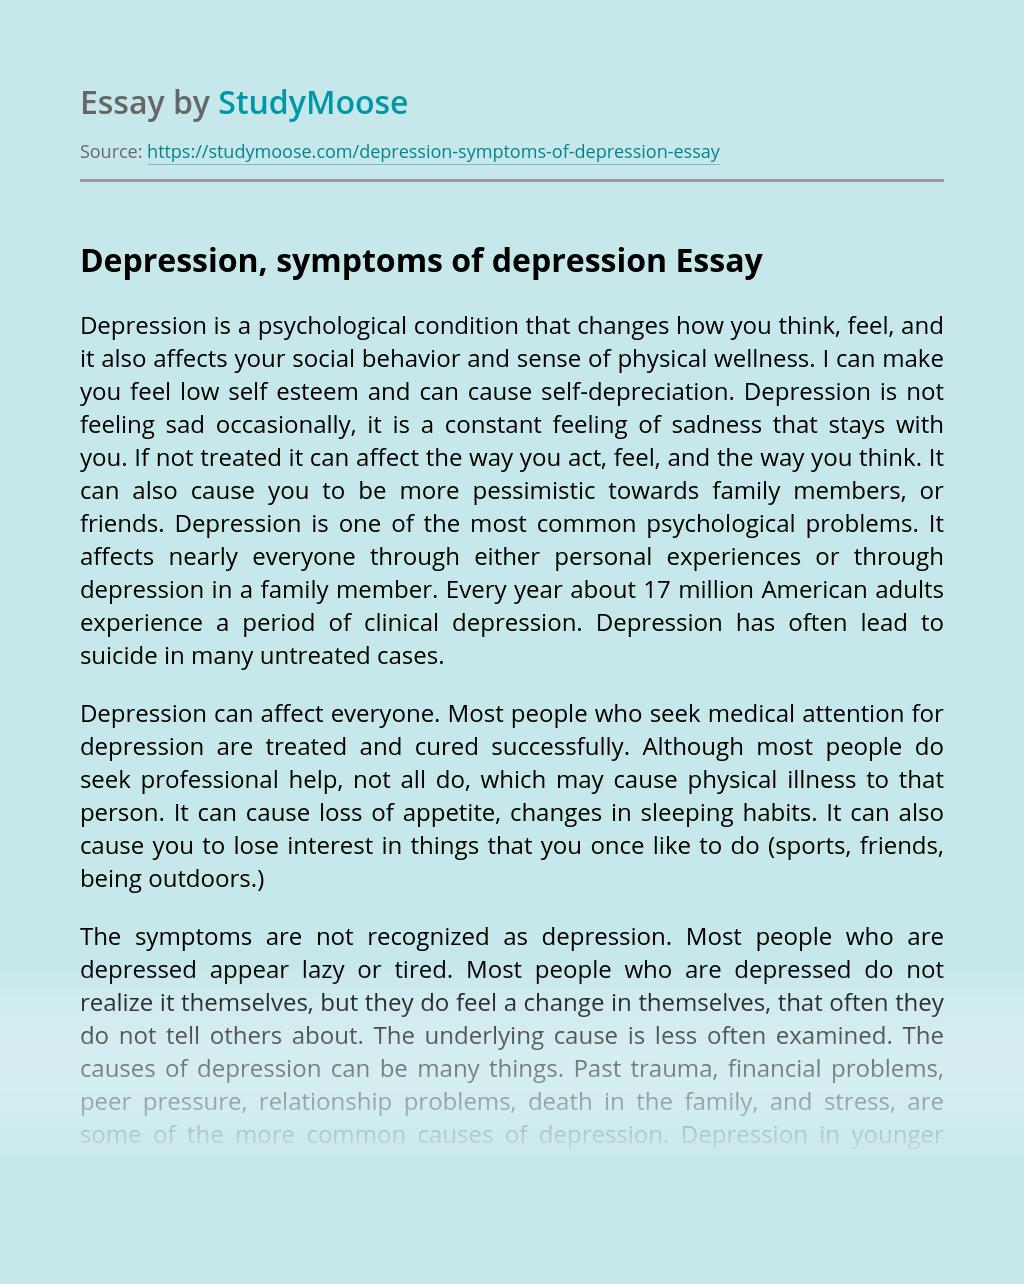 Depression, symptoms of depression